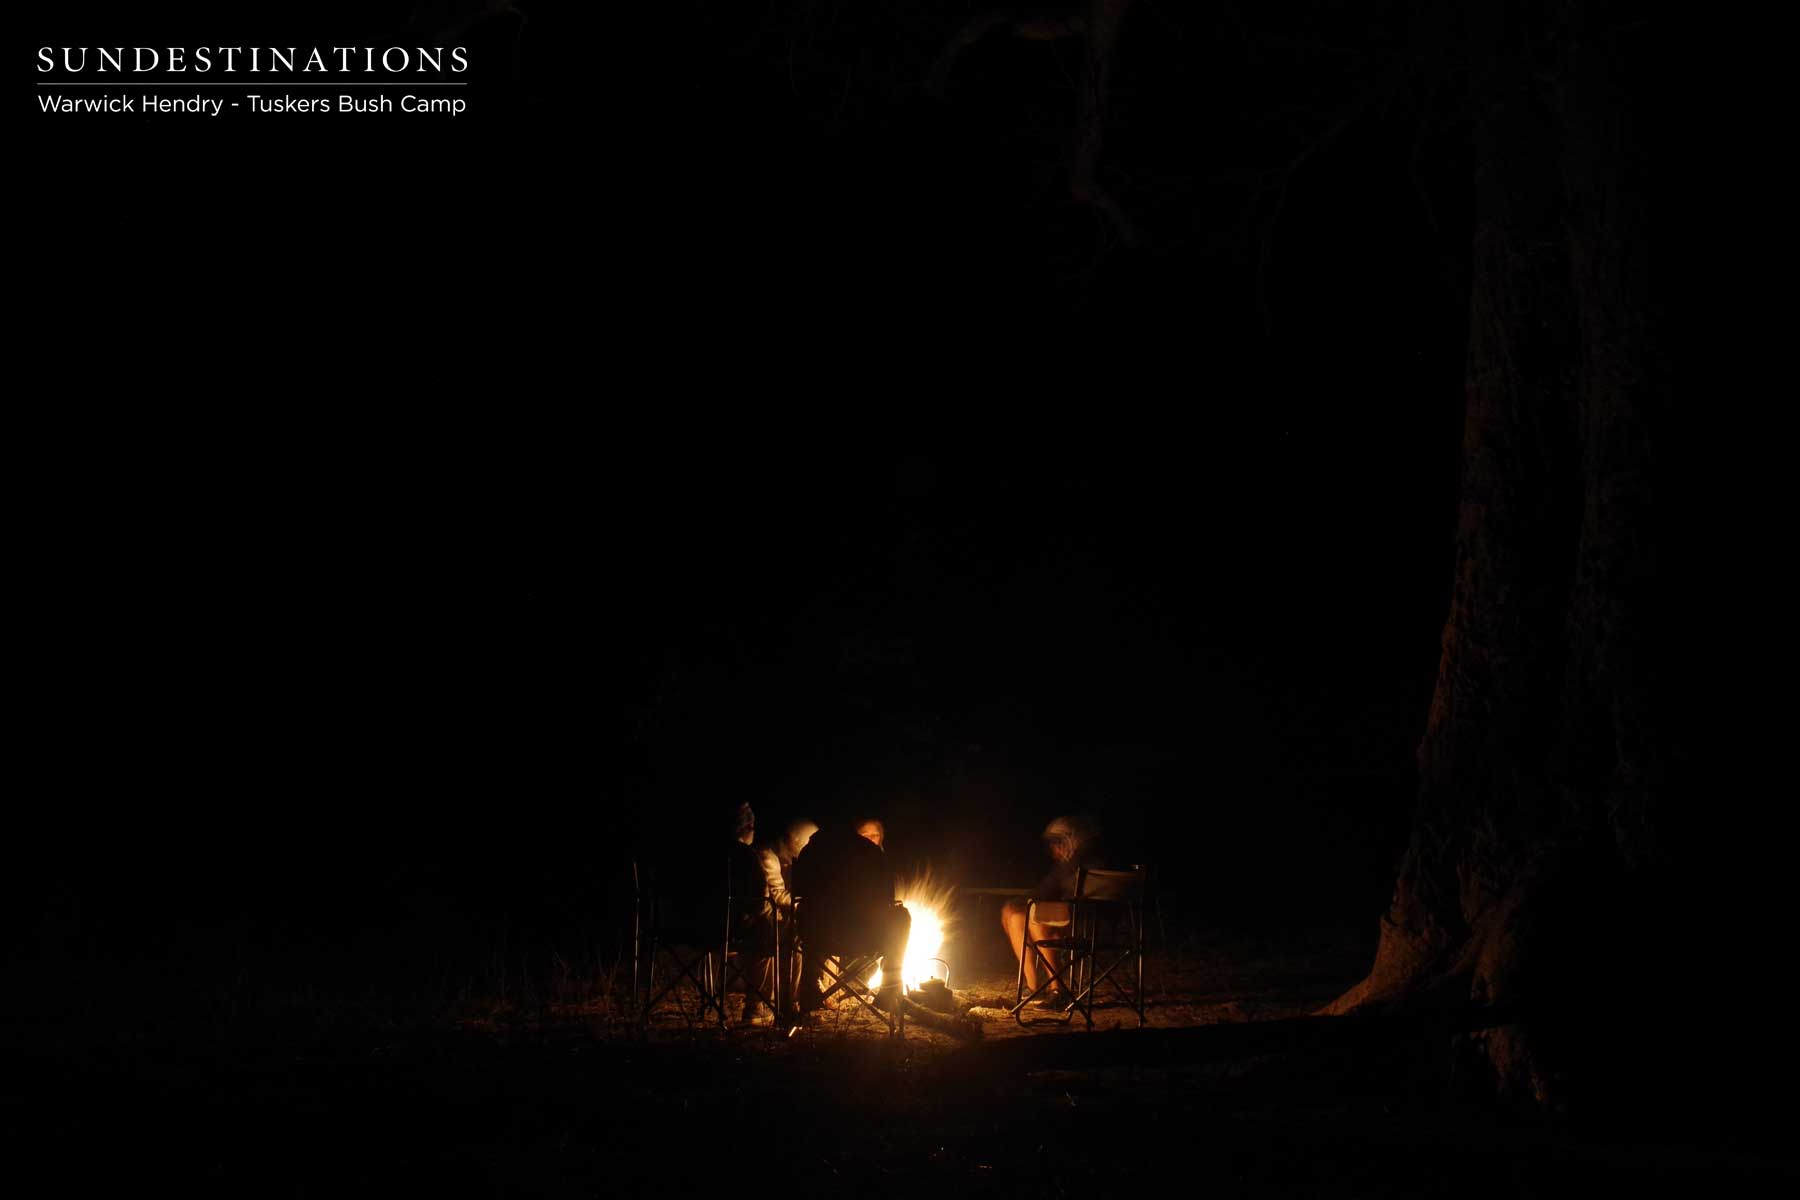 Tuskers Bush Camp Fire